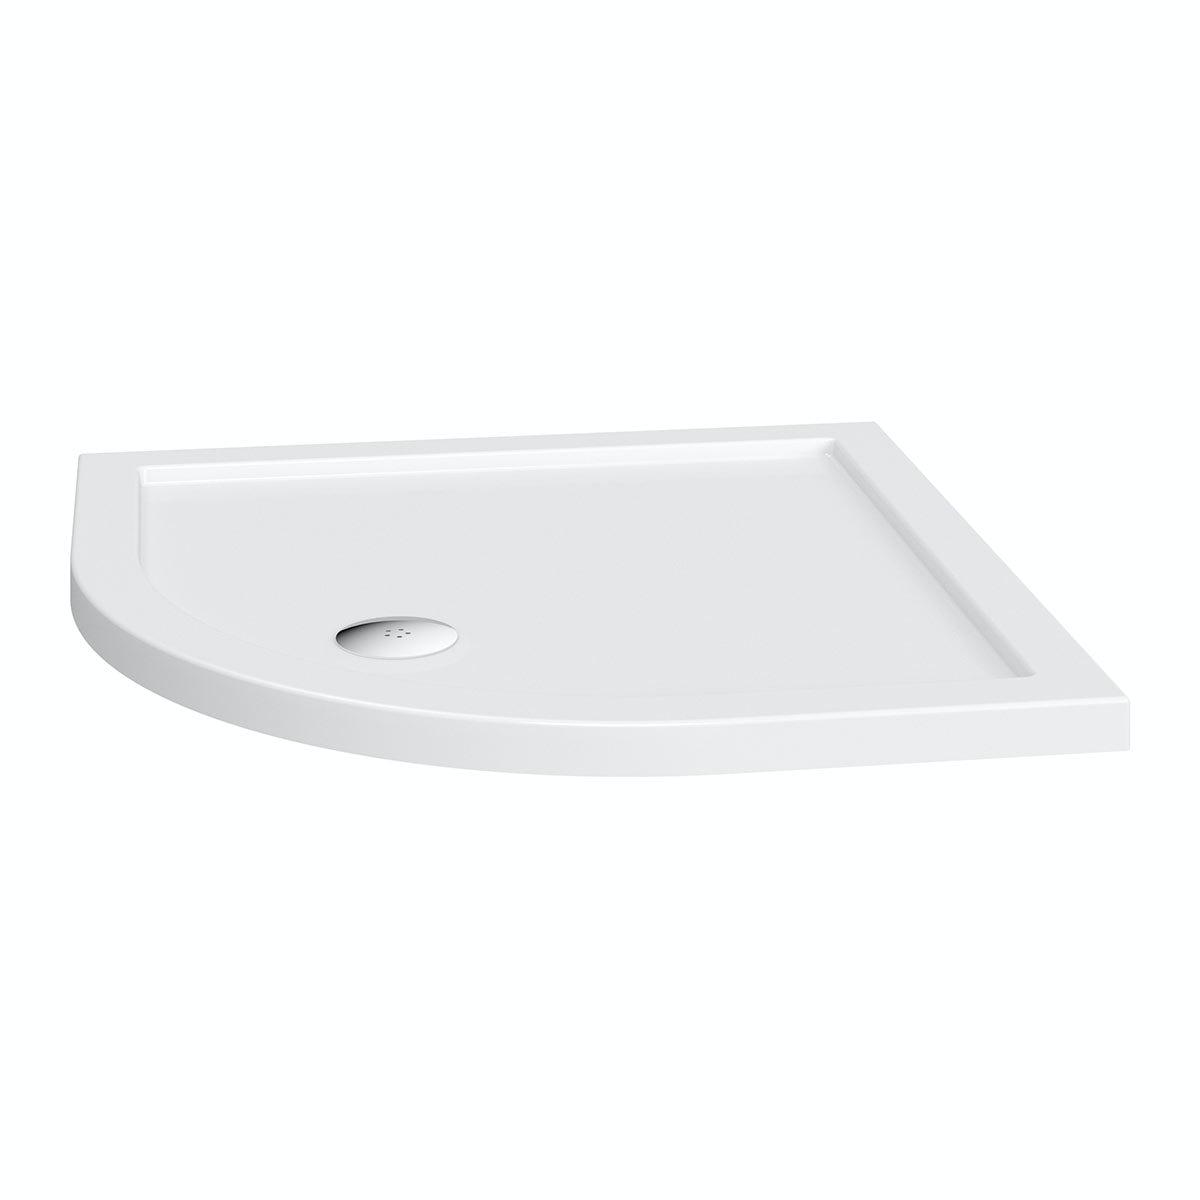 Quadrant Stone Shower Tray